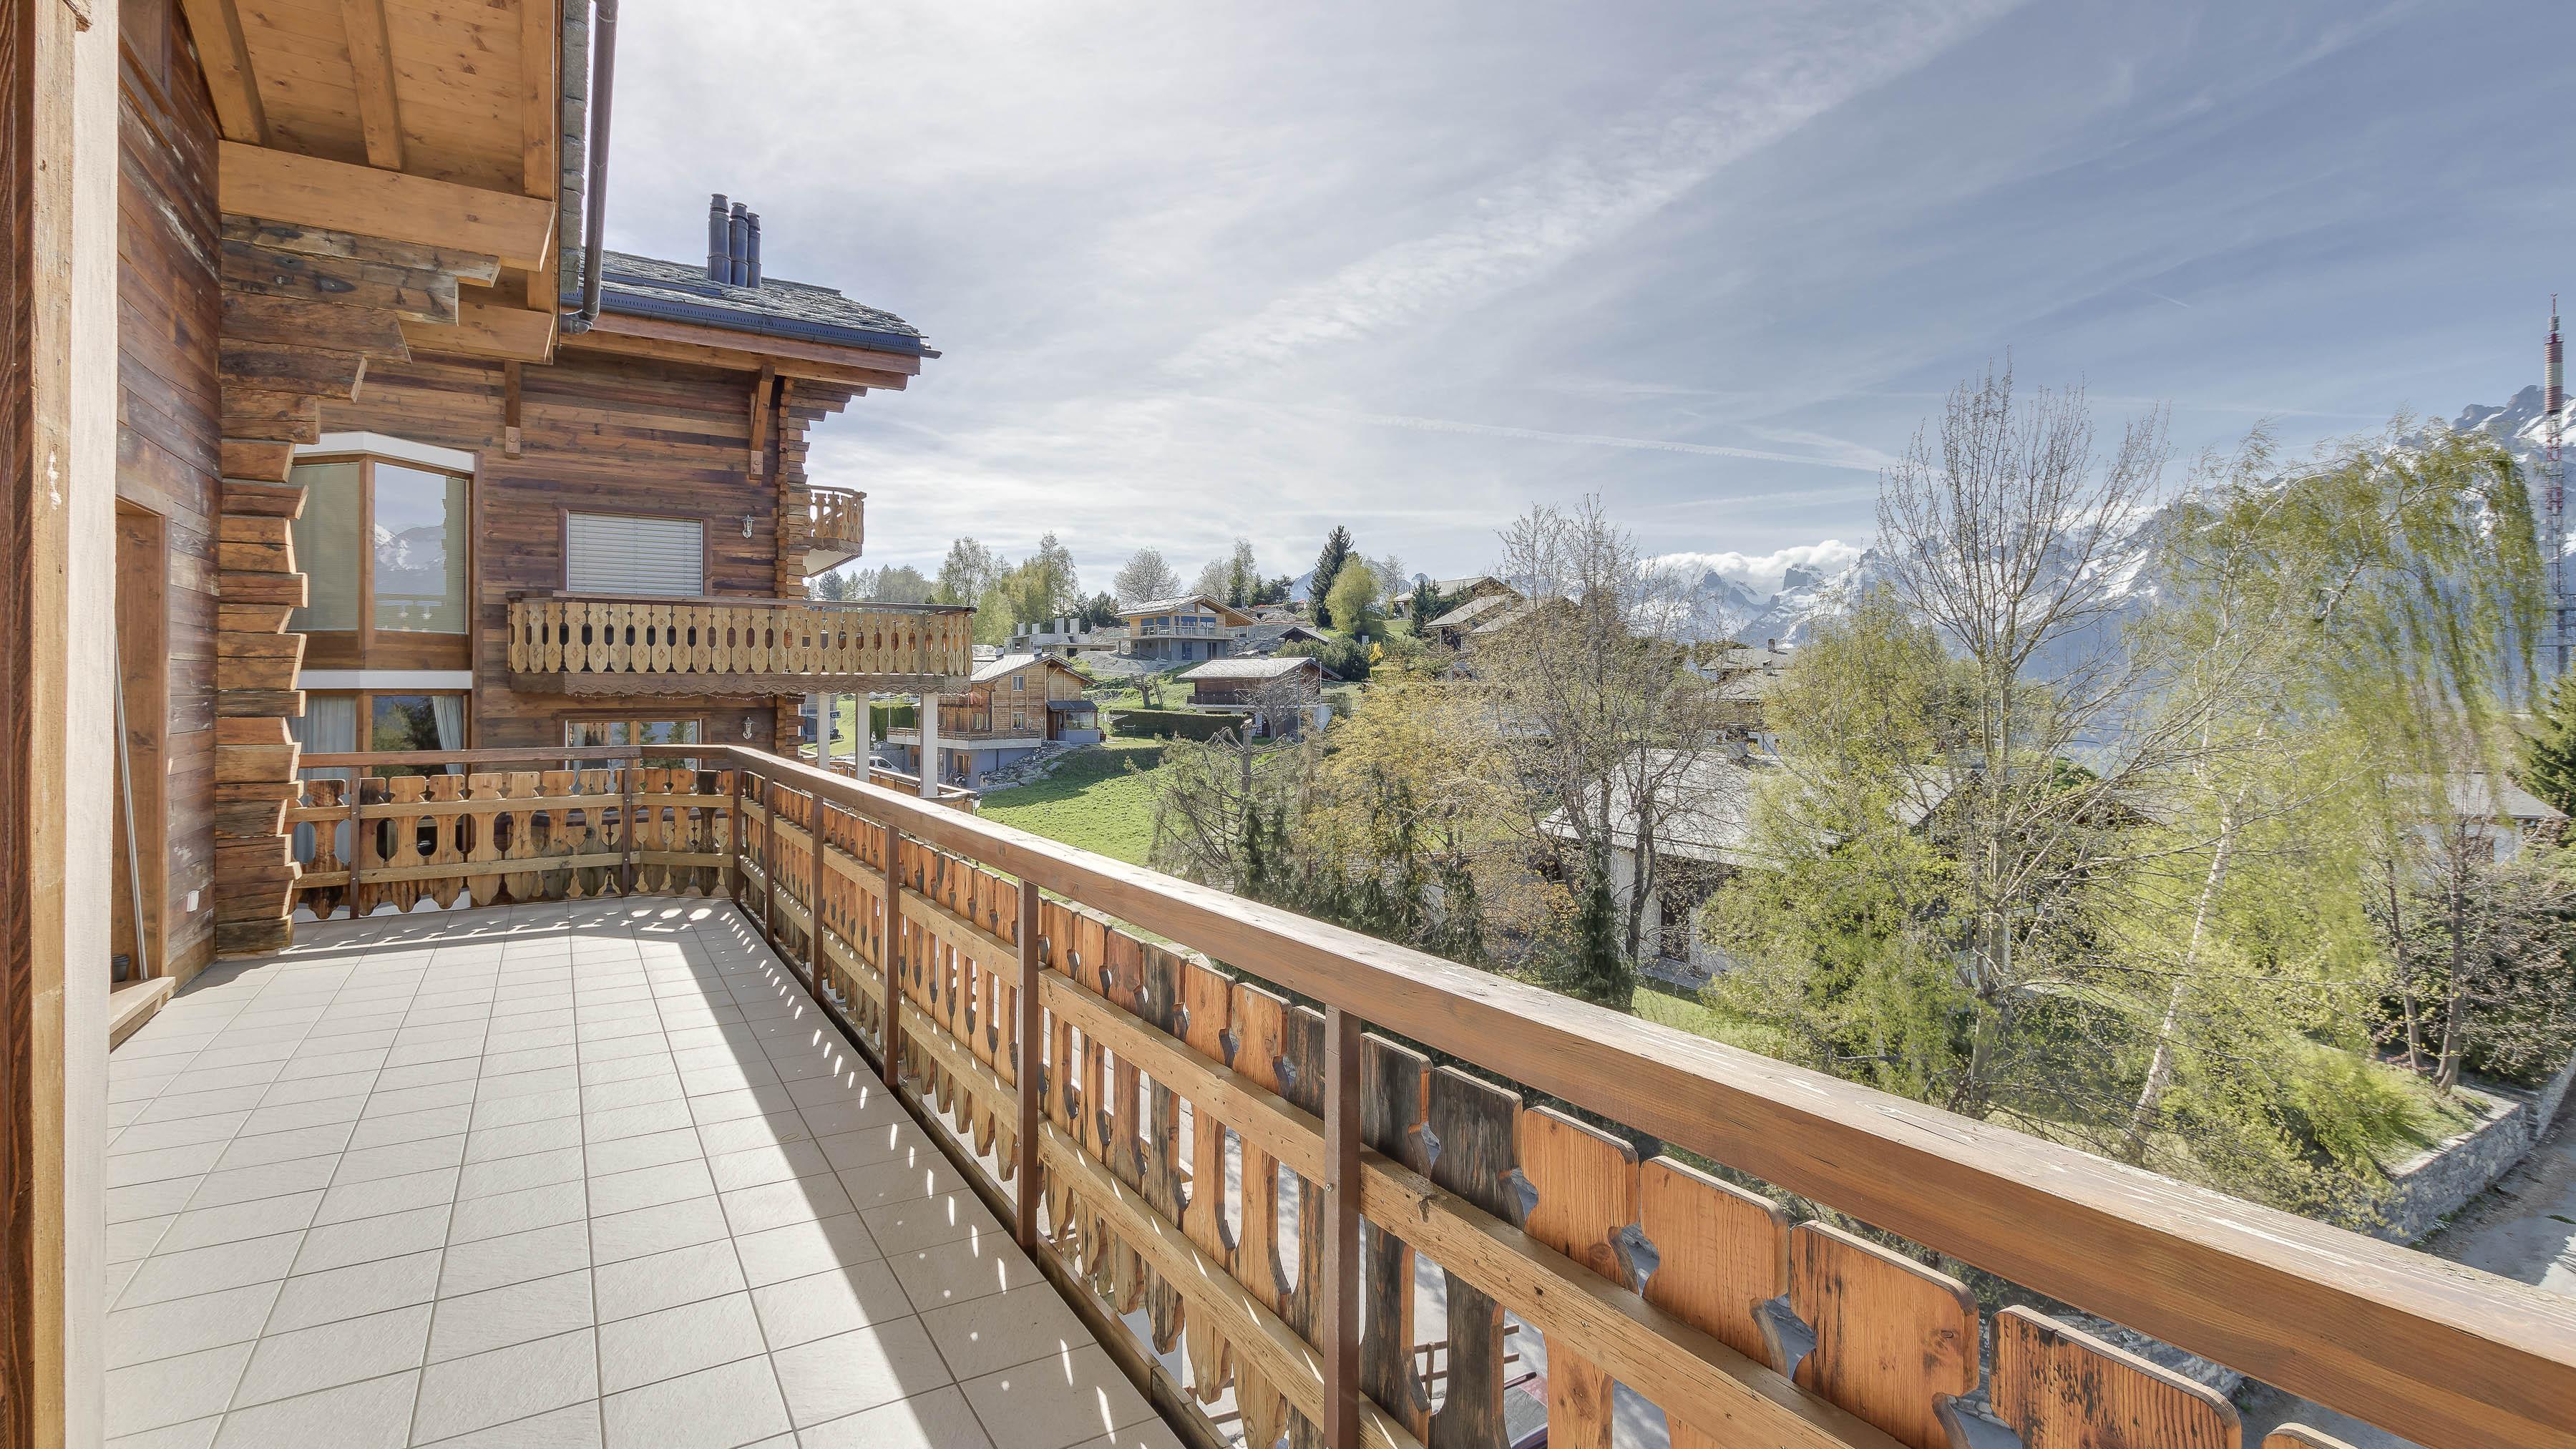 Cimes Blanches Apartments, Switzerland